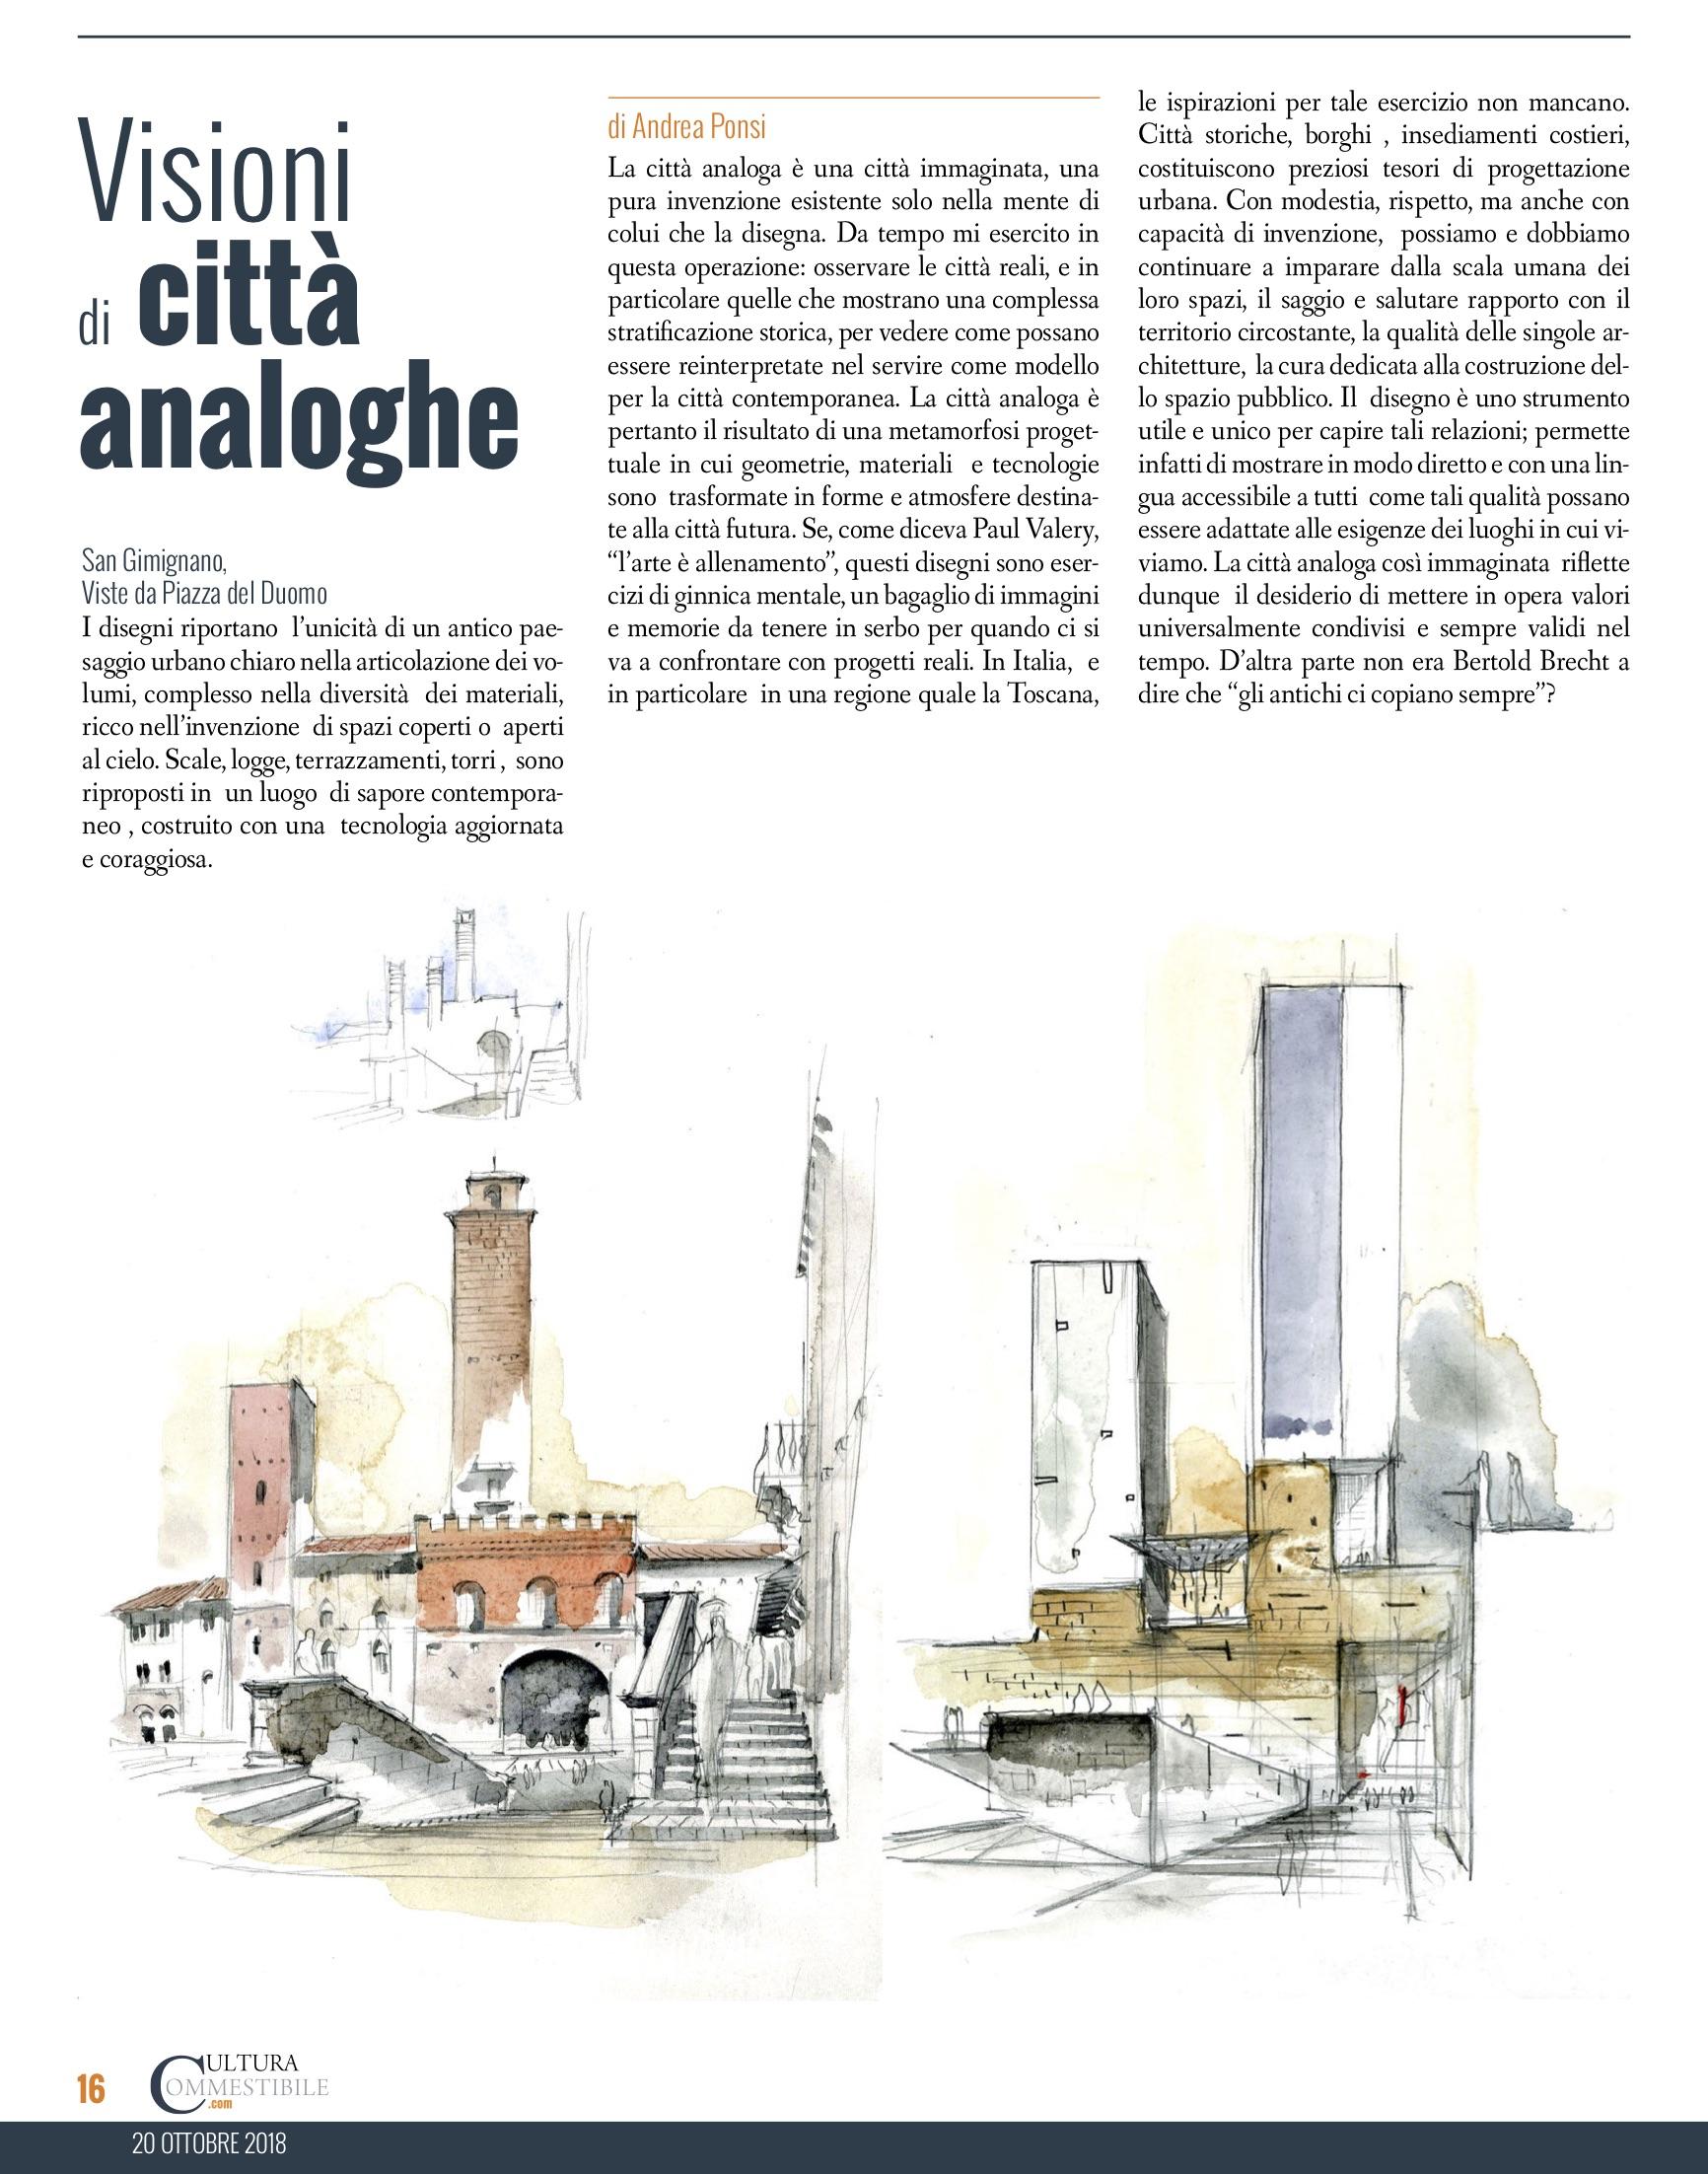 Cultura-Commestibile-281_Citta analoghe.jpg